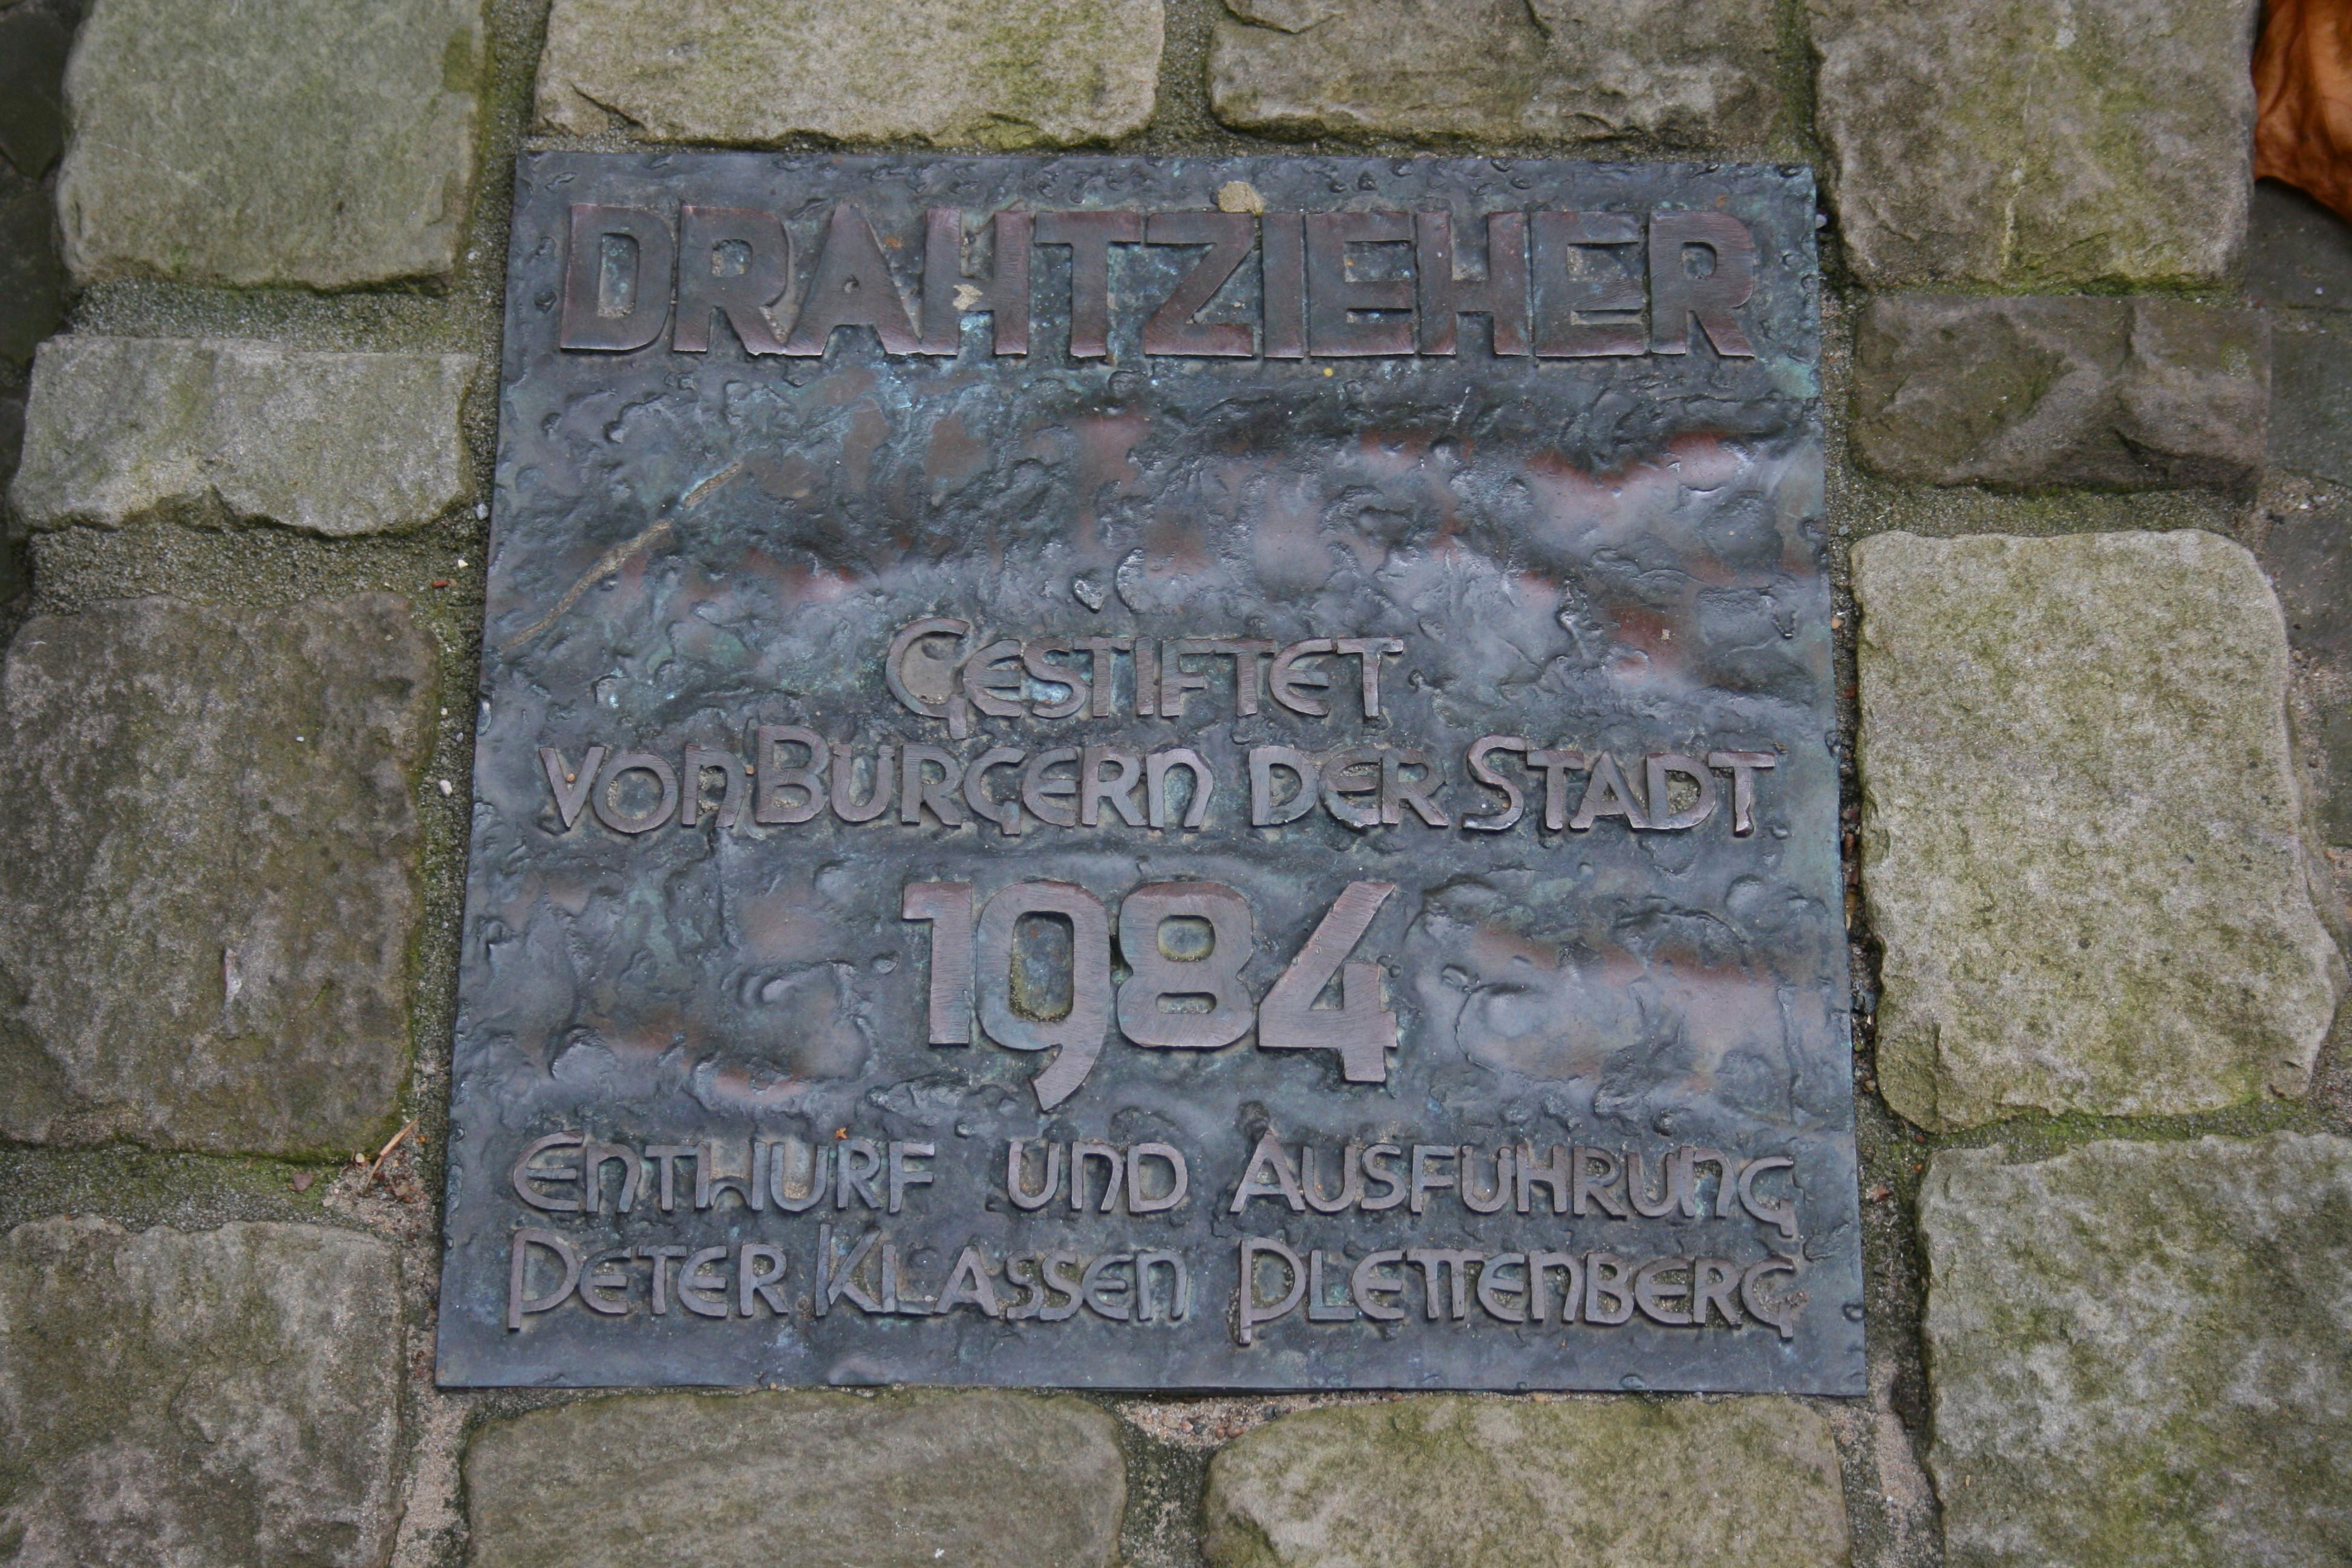 File:Altena - Jägerplatz - Drahtzieher 04 ies.jpg - Wikimedia Commons